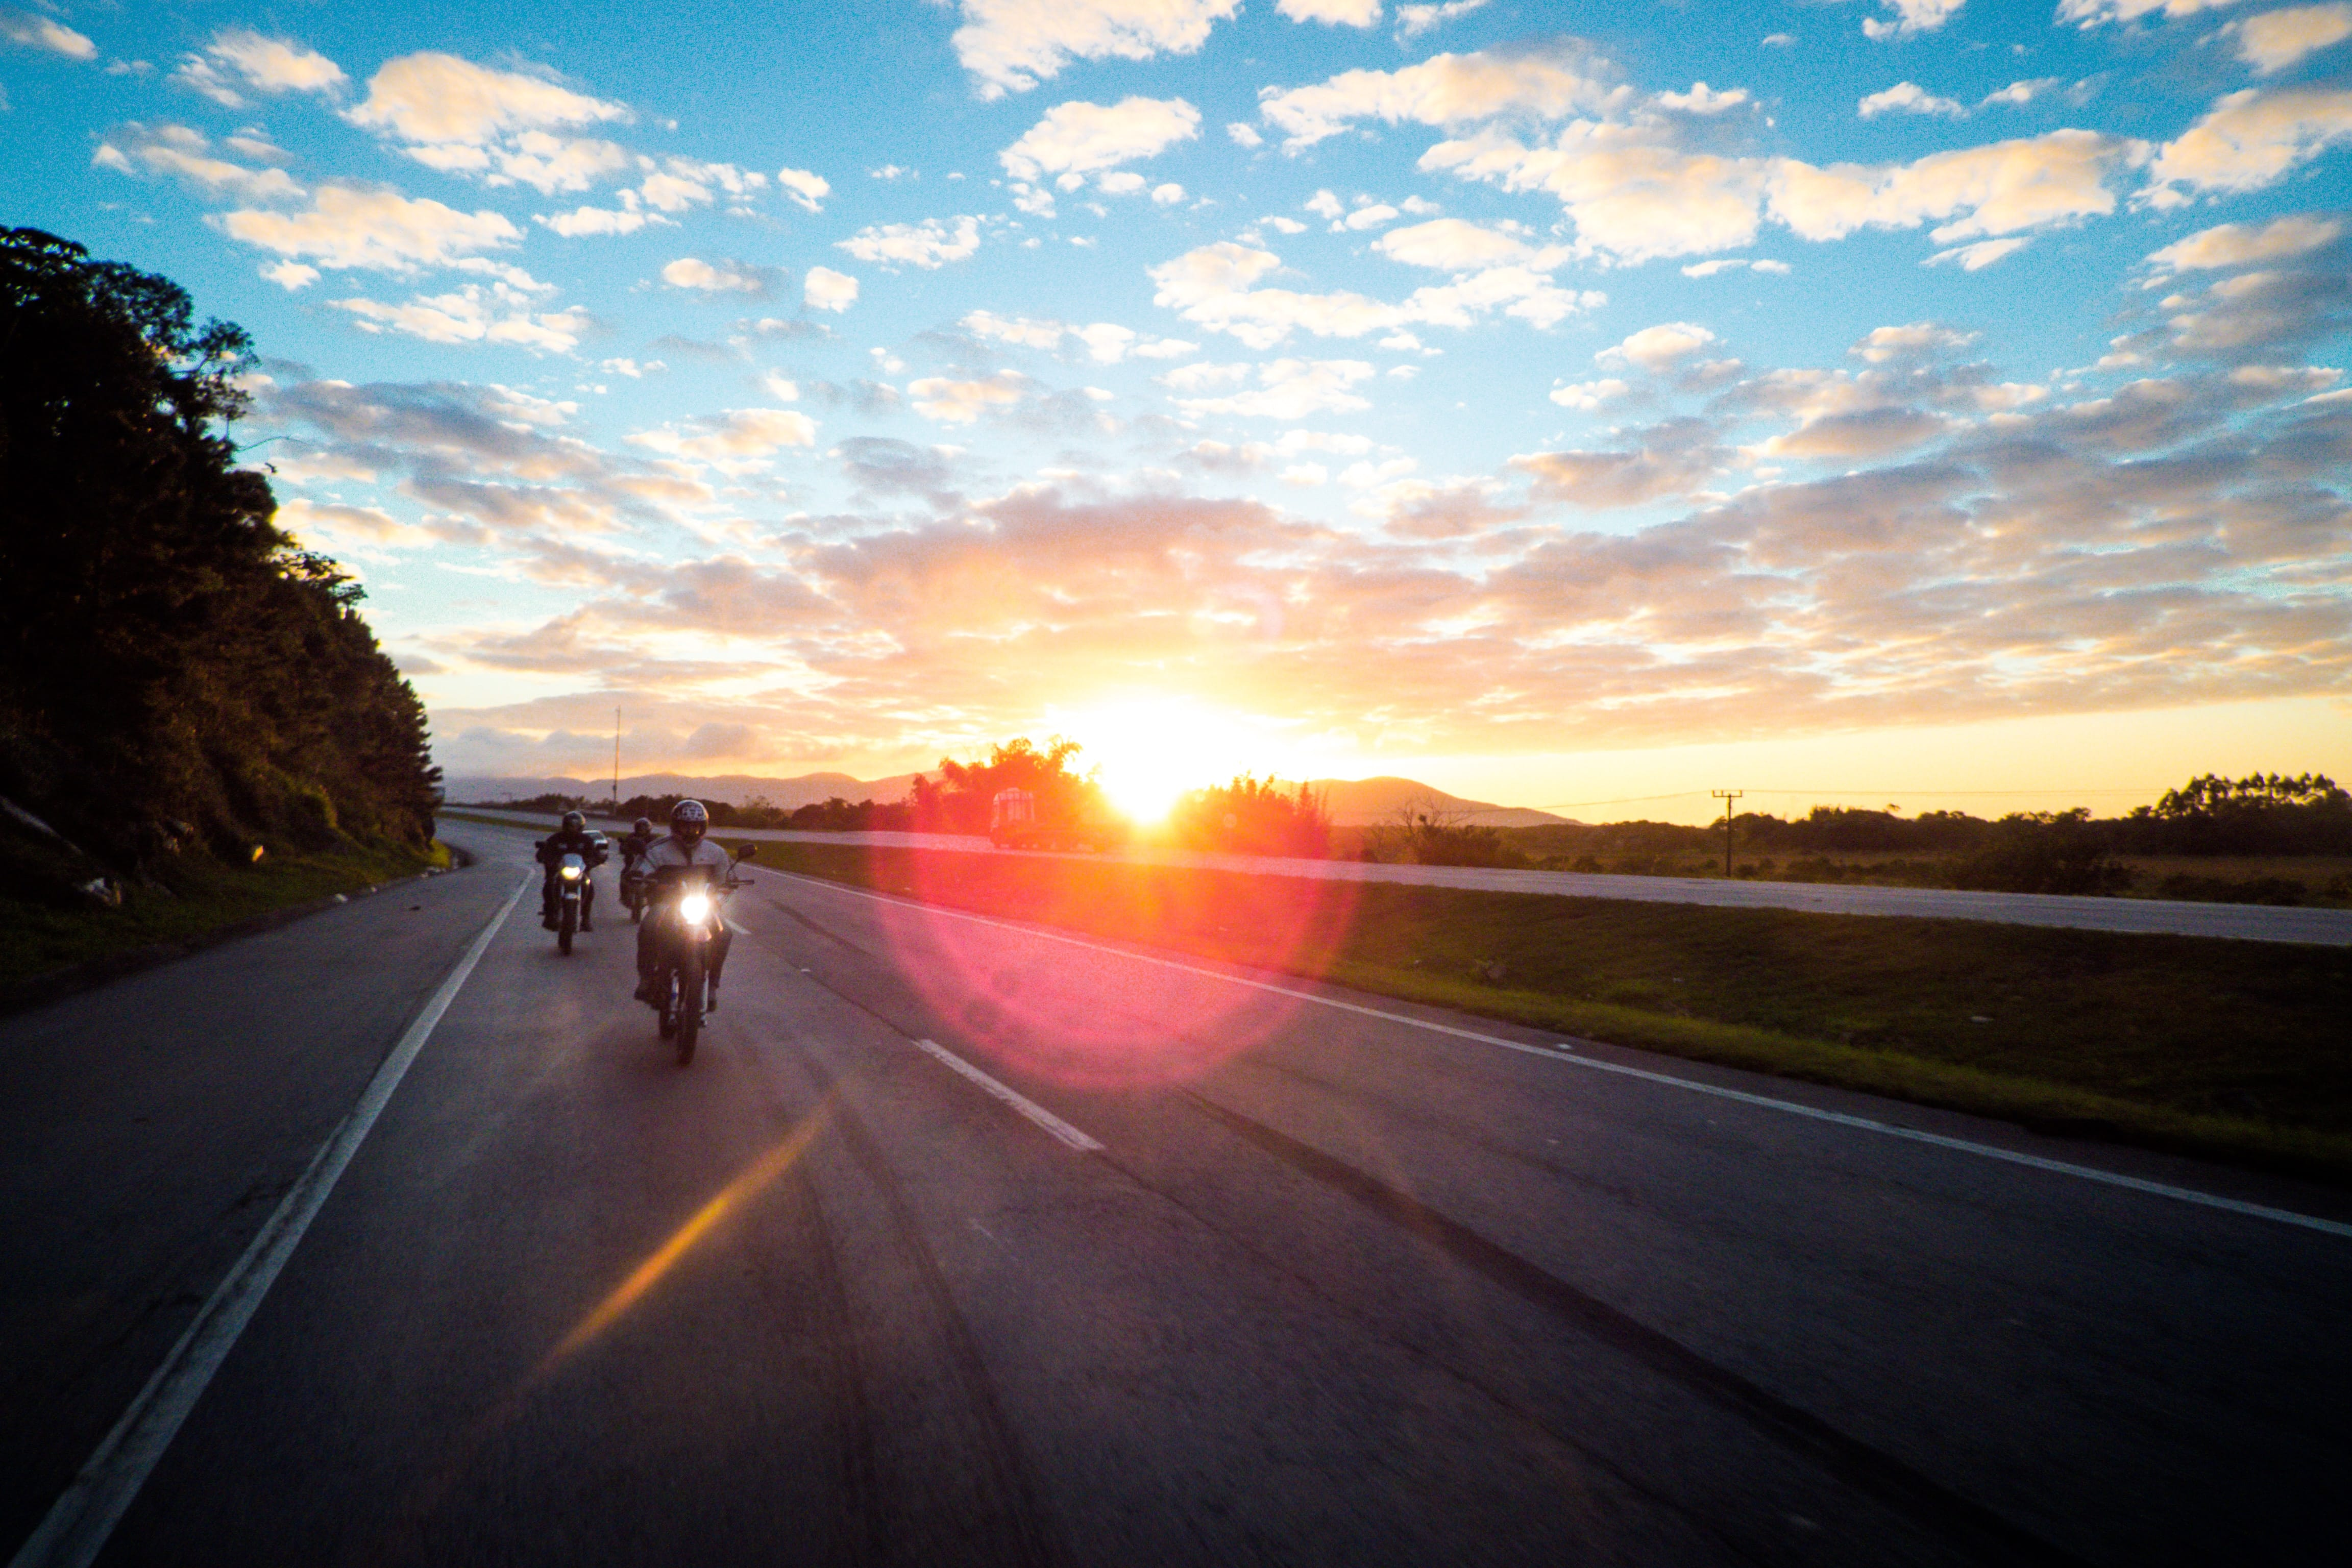 $3 8 Million Motorcycle Accident Verdict for Hillsborough